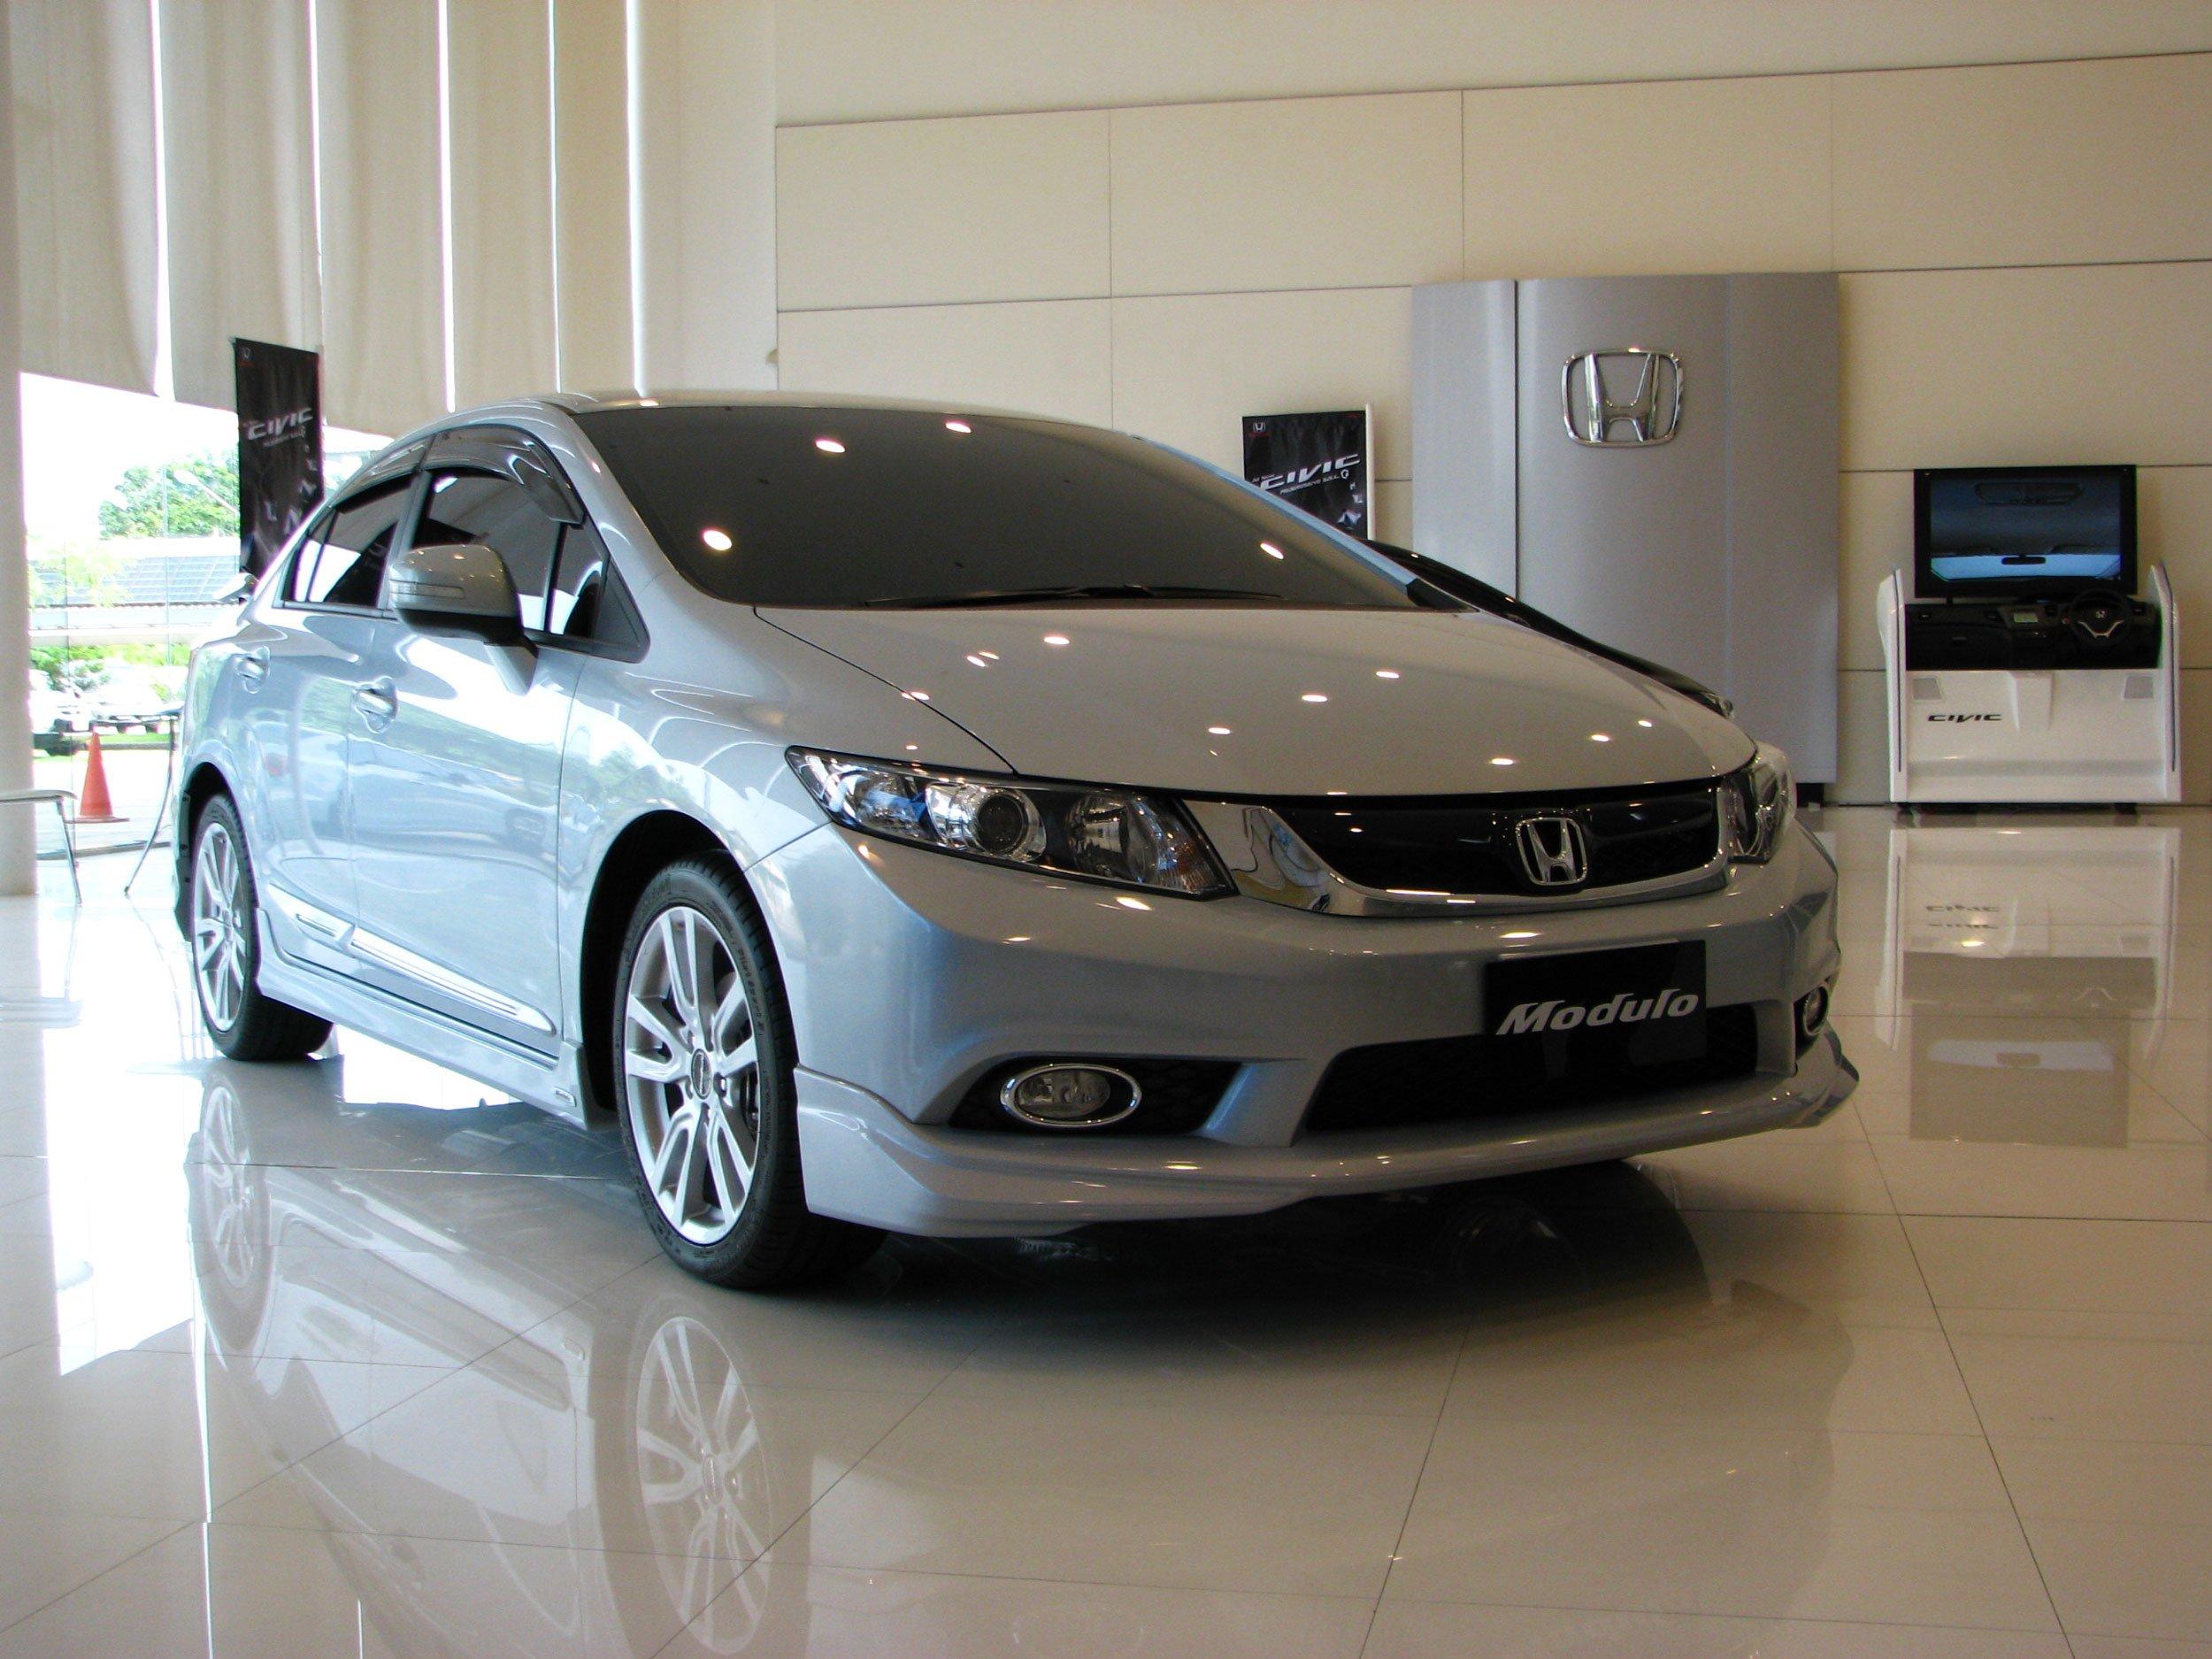 Honda Civic S 2018 >> DRIVEN: 2012 Honda Civic FB (9th Gen) previewed in Thailand – not pretty, but handles ...